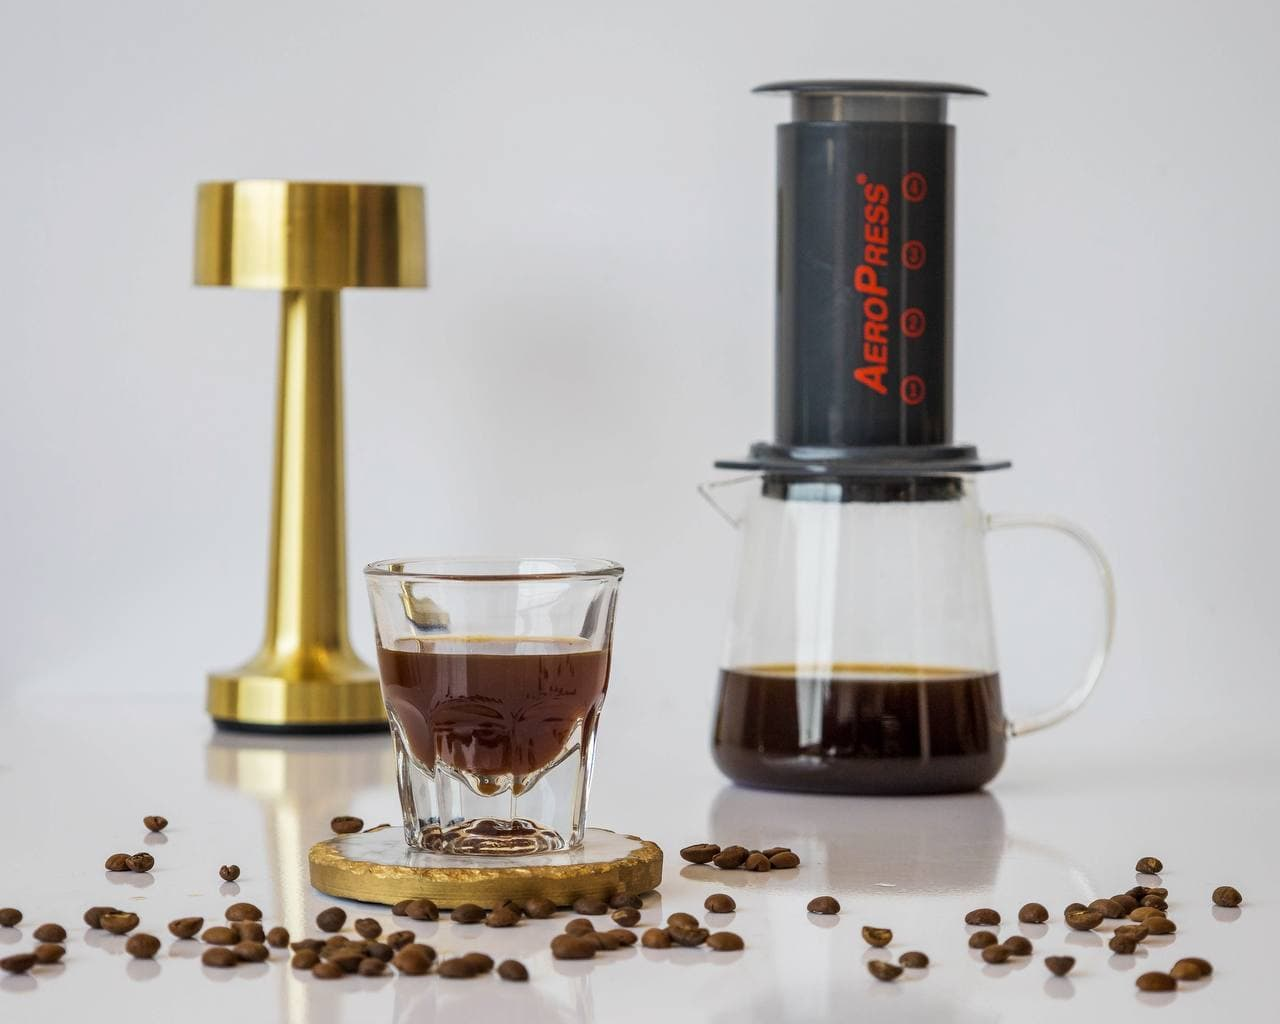 aeropress BLACK MANUAL BREW FILTER COFFEE